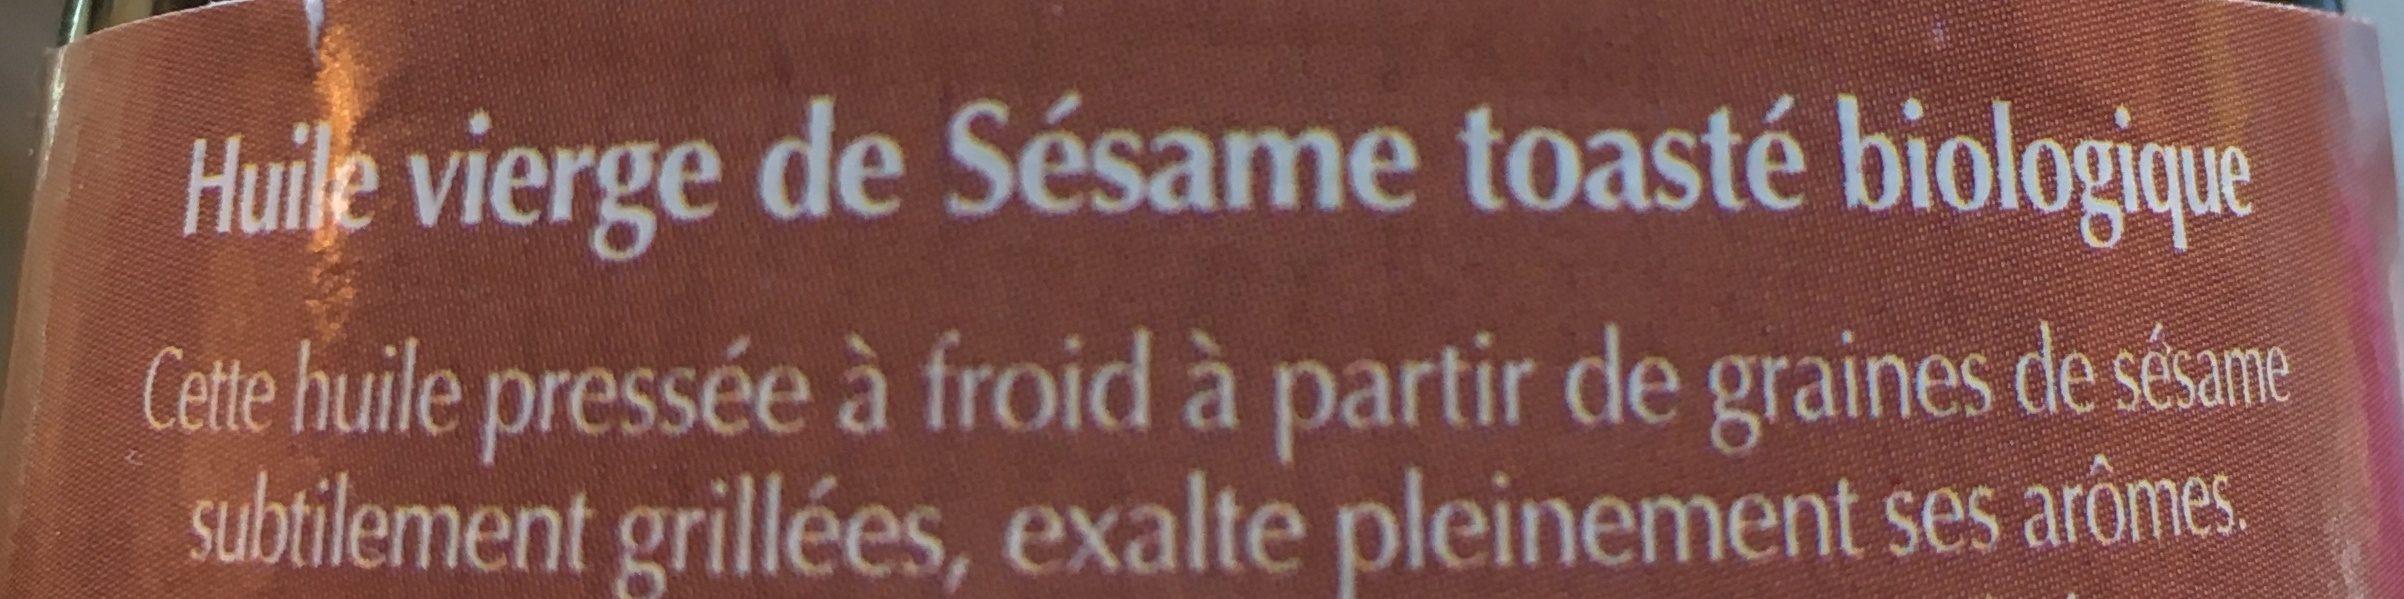 HUILE VIERGE DE SESAME TOASTE - Ingrédients - fr